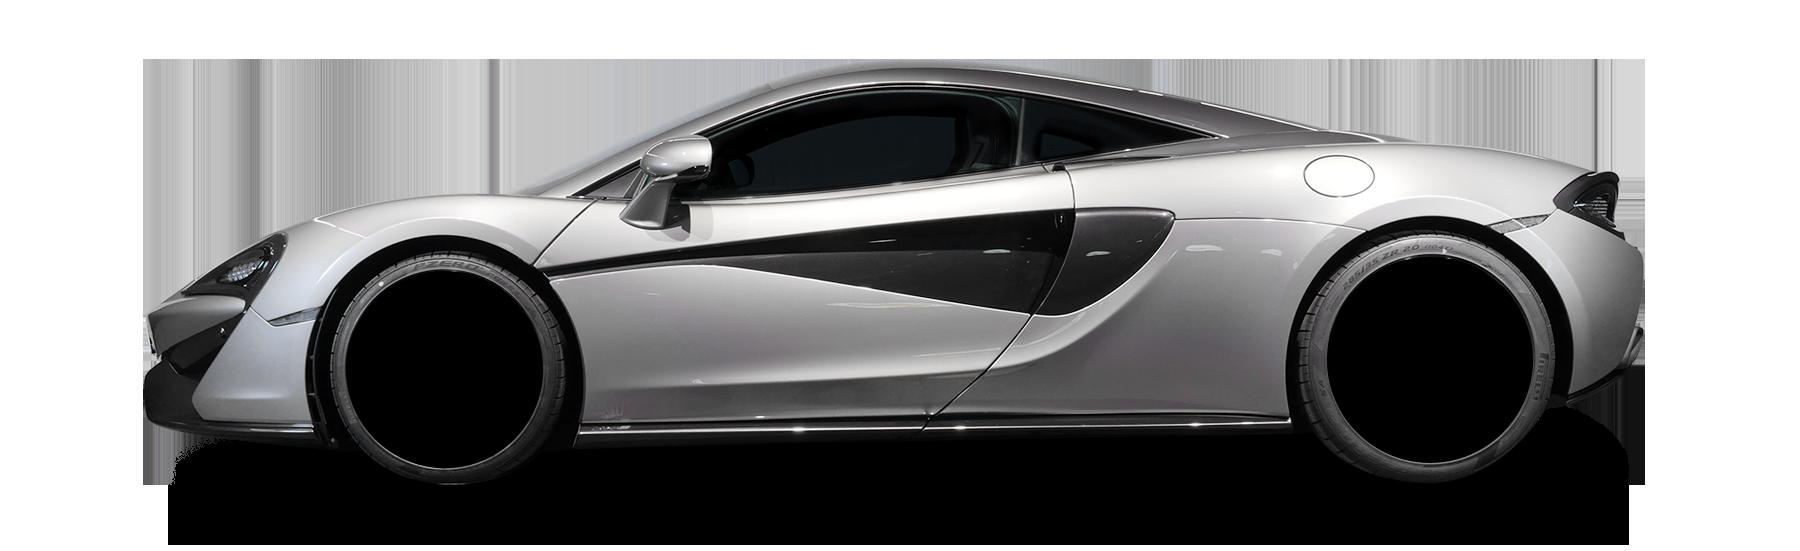 AIL McLaren Blade linkes Profil